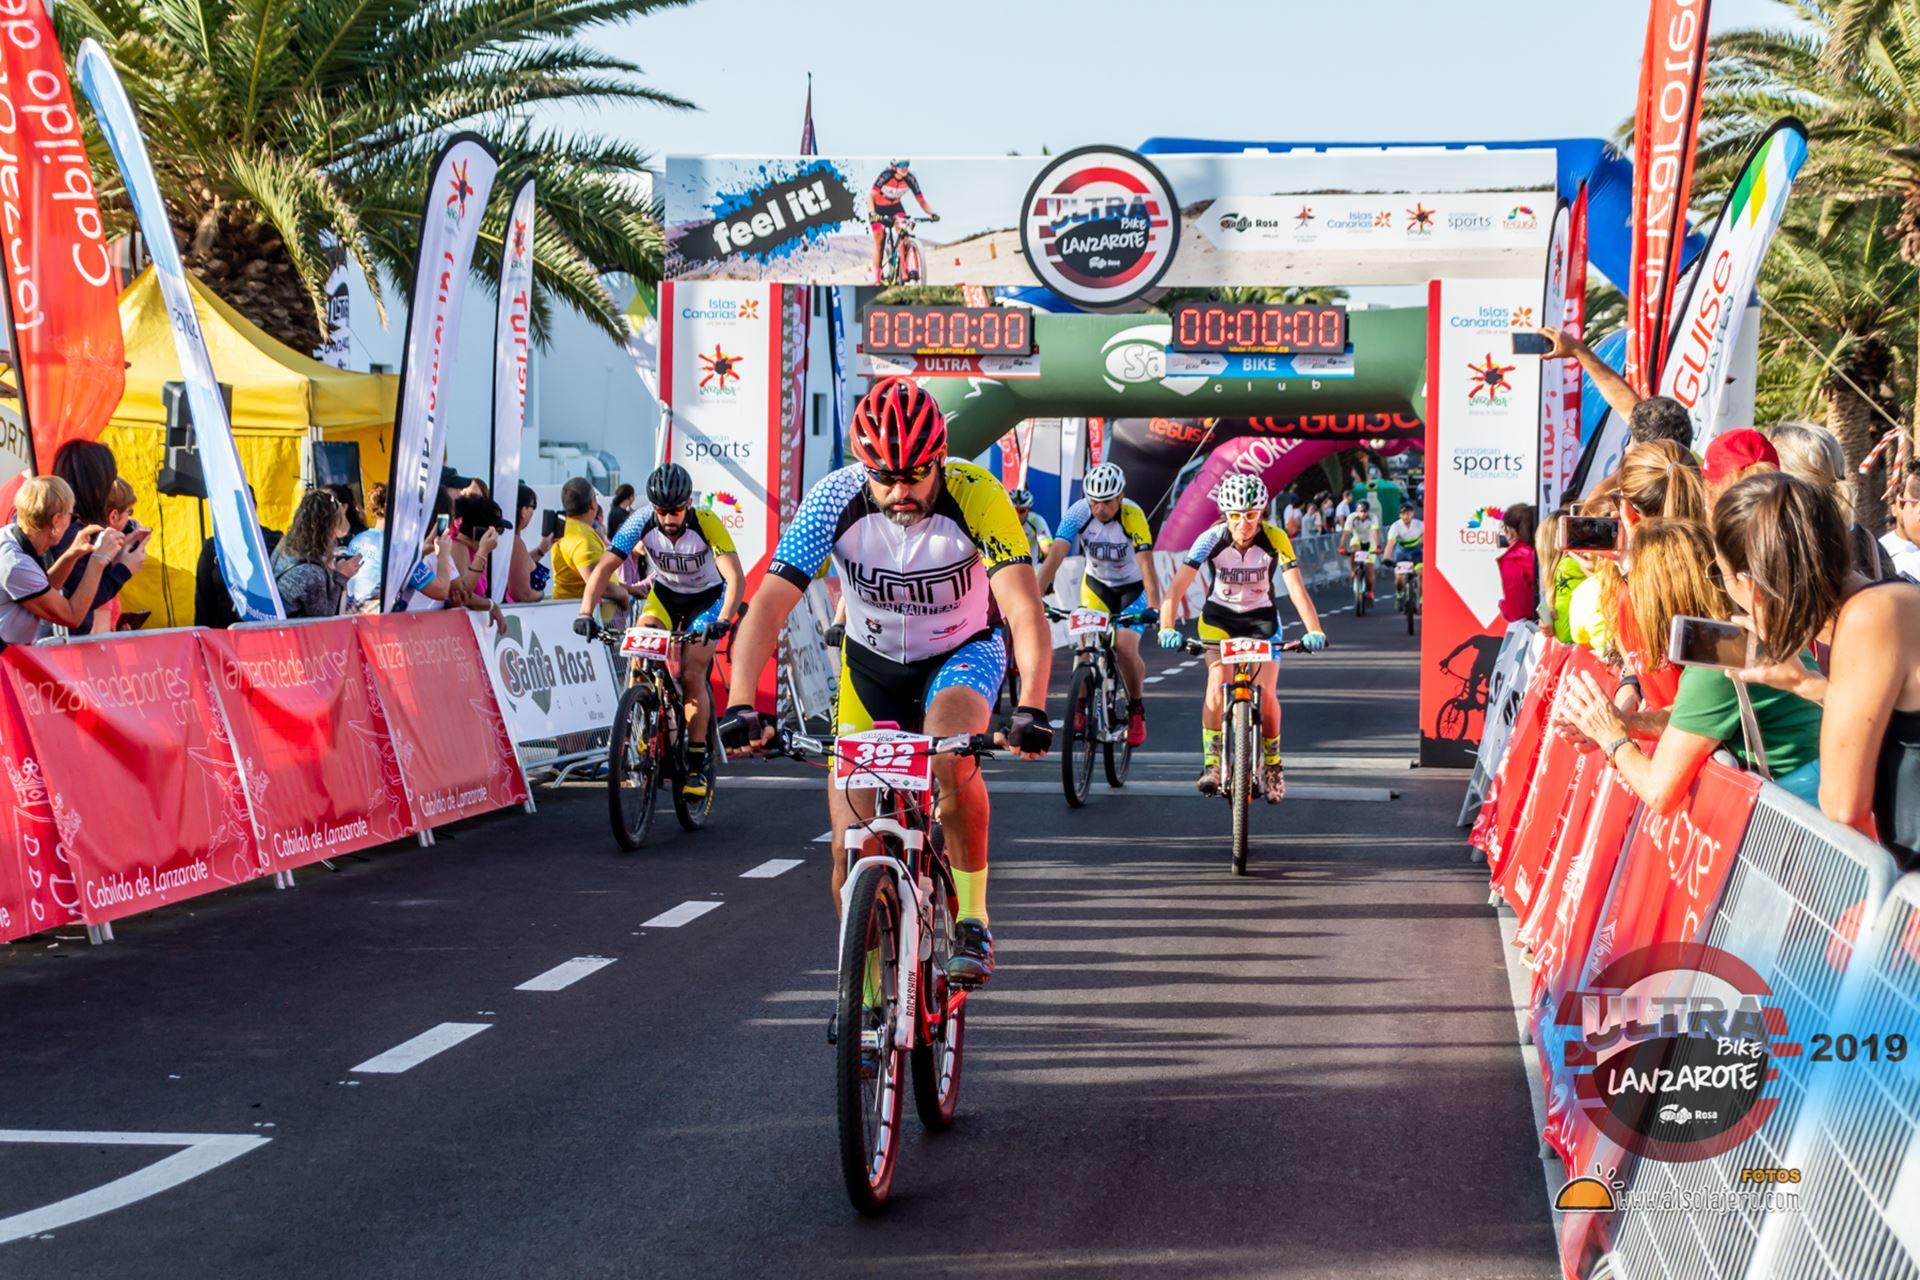 Salida 2ª Etapa Ultrabike 2019 Fotos Alsolajero.com-59